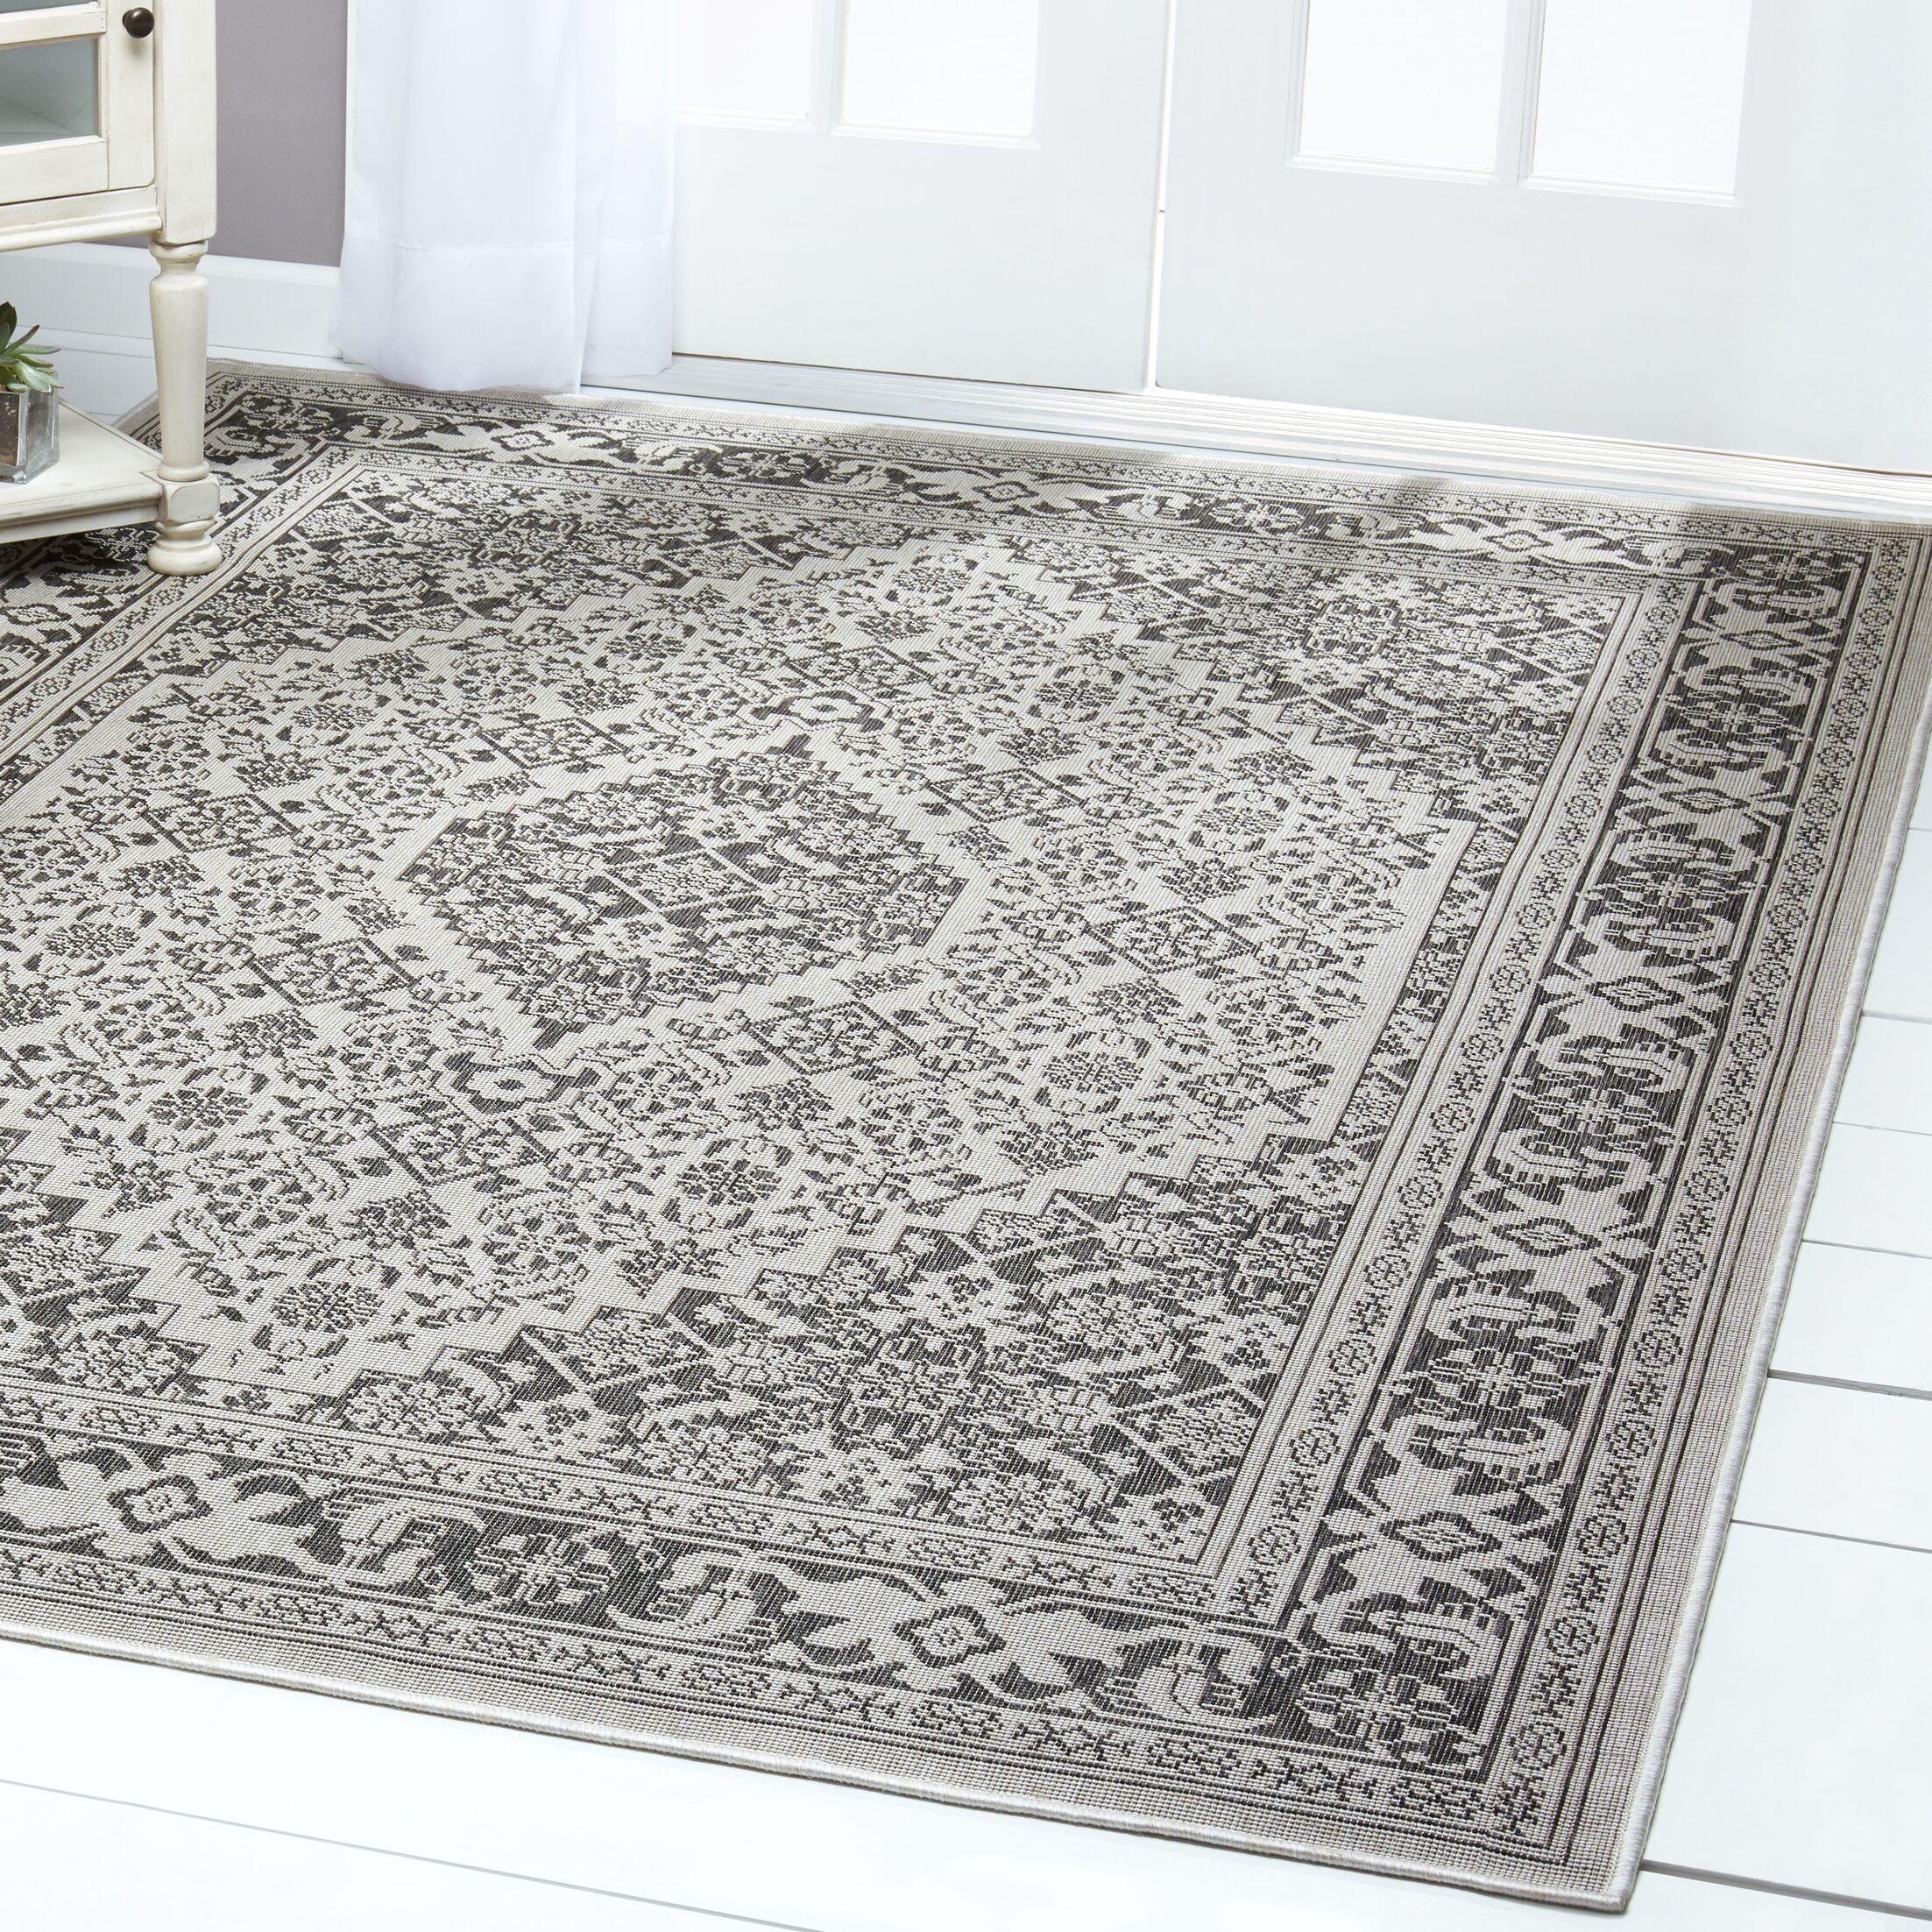 Persian Gray/Black Indoor/Outdoor Area Rug Rug Size: Rectangle 7'9